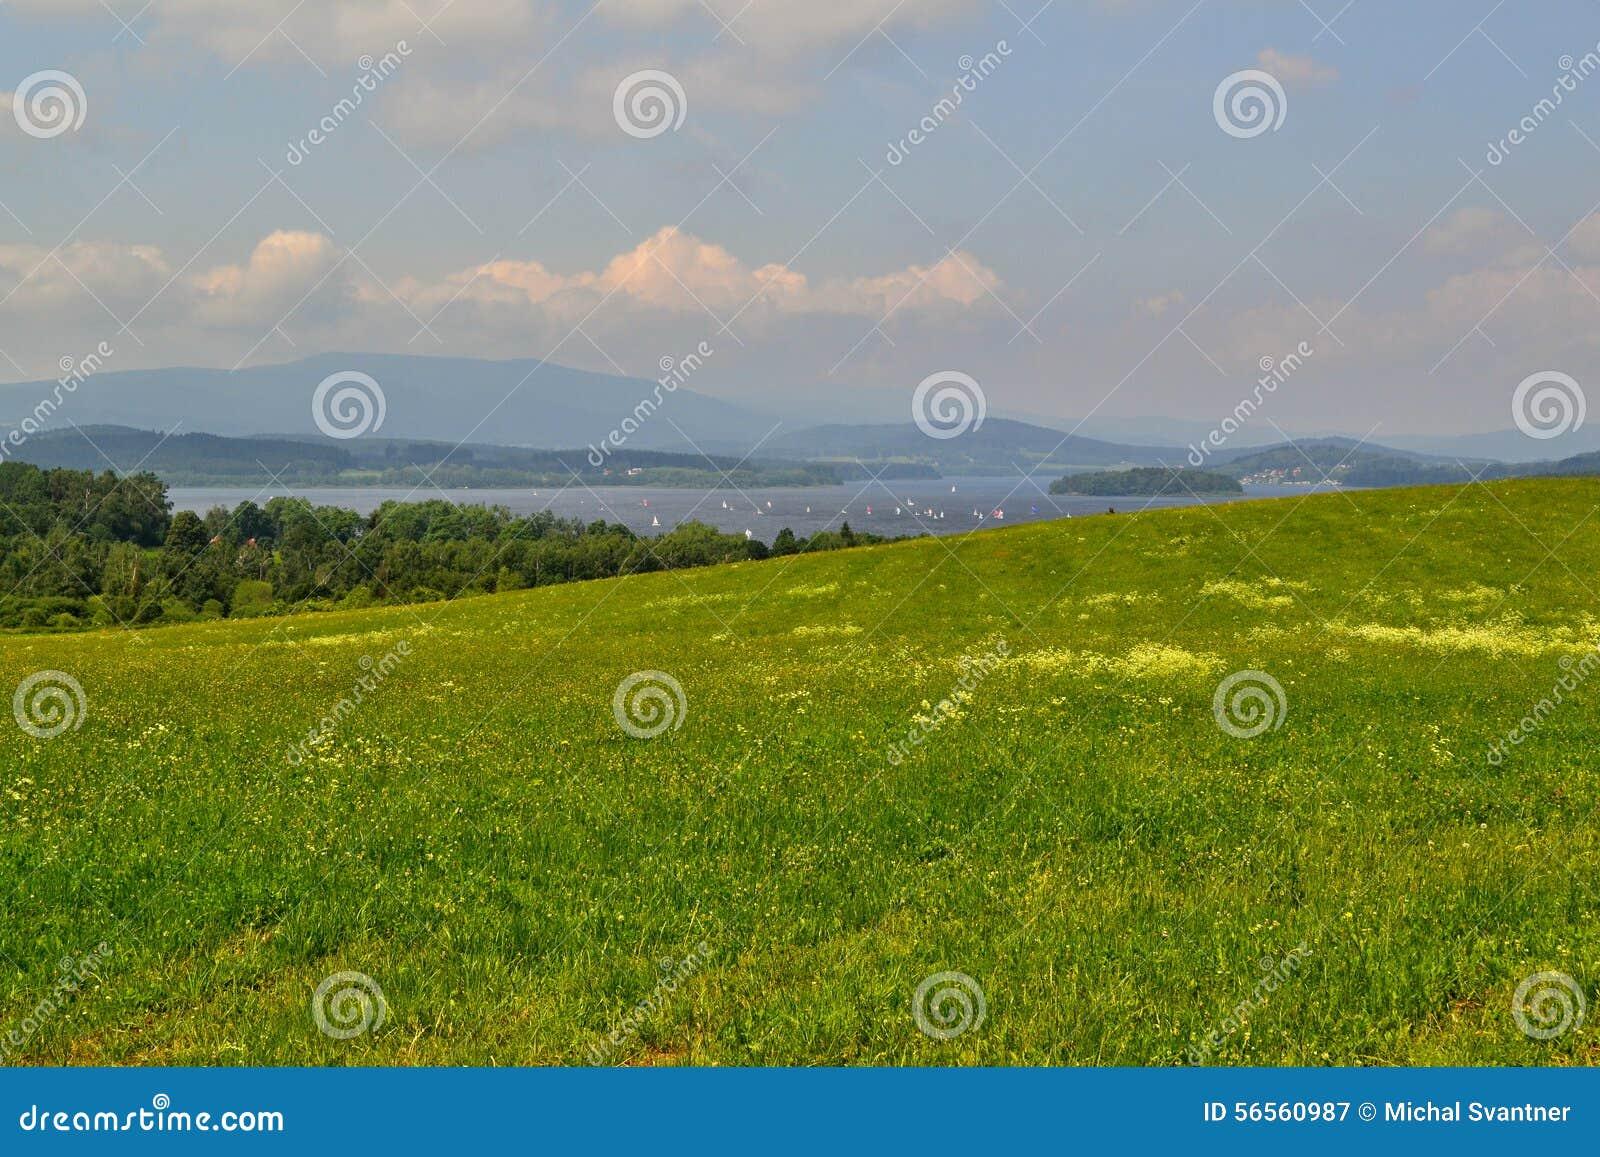 Download Πράσινο λιβάδι με μια λίμνη στο υπόβαθρο Στοκ Εικόνα - εικόνα από ουρανός, νομός: 56560987